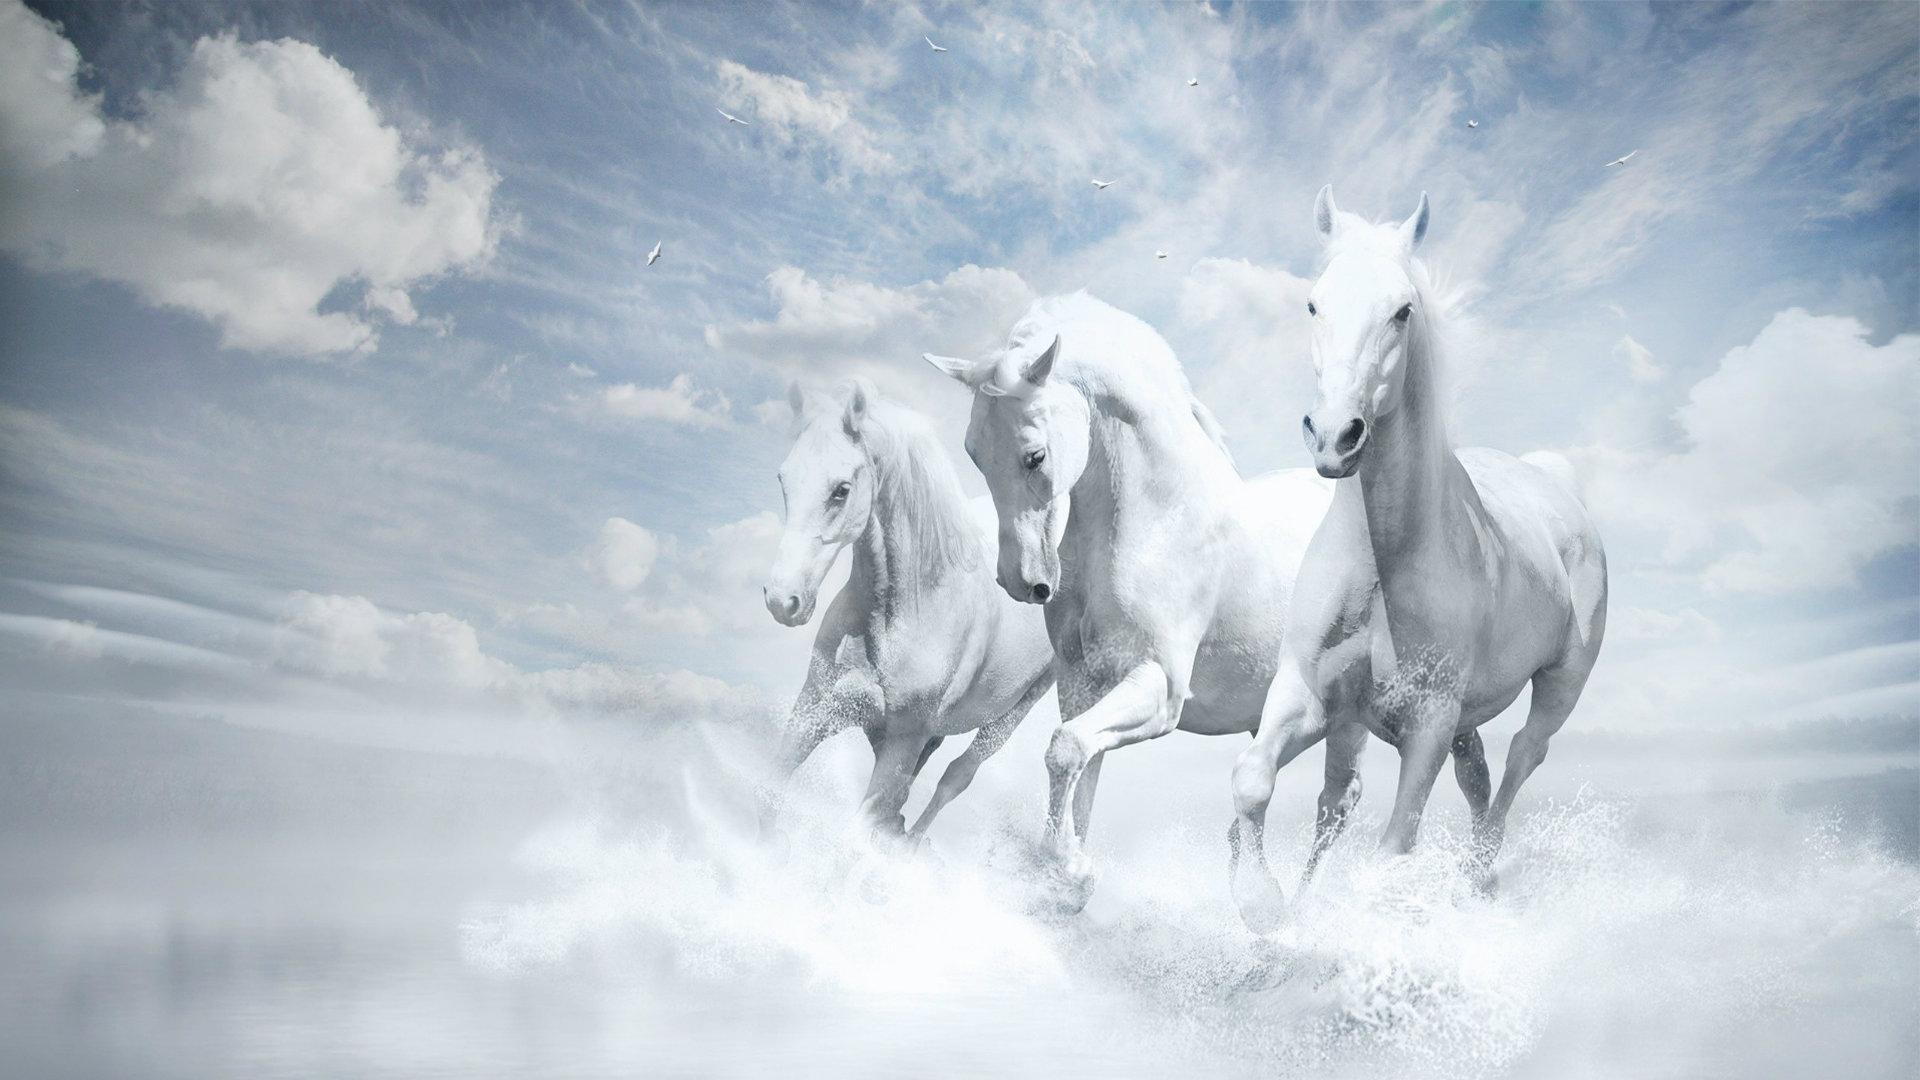 White Horses HD Wallpapers Horses For Desktop HD 1920x1080